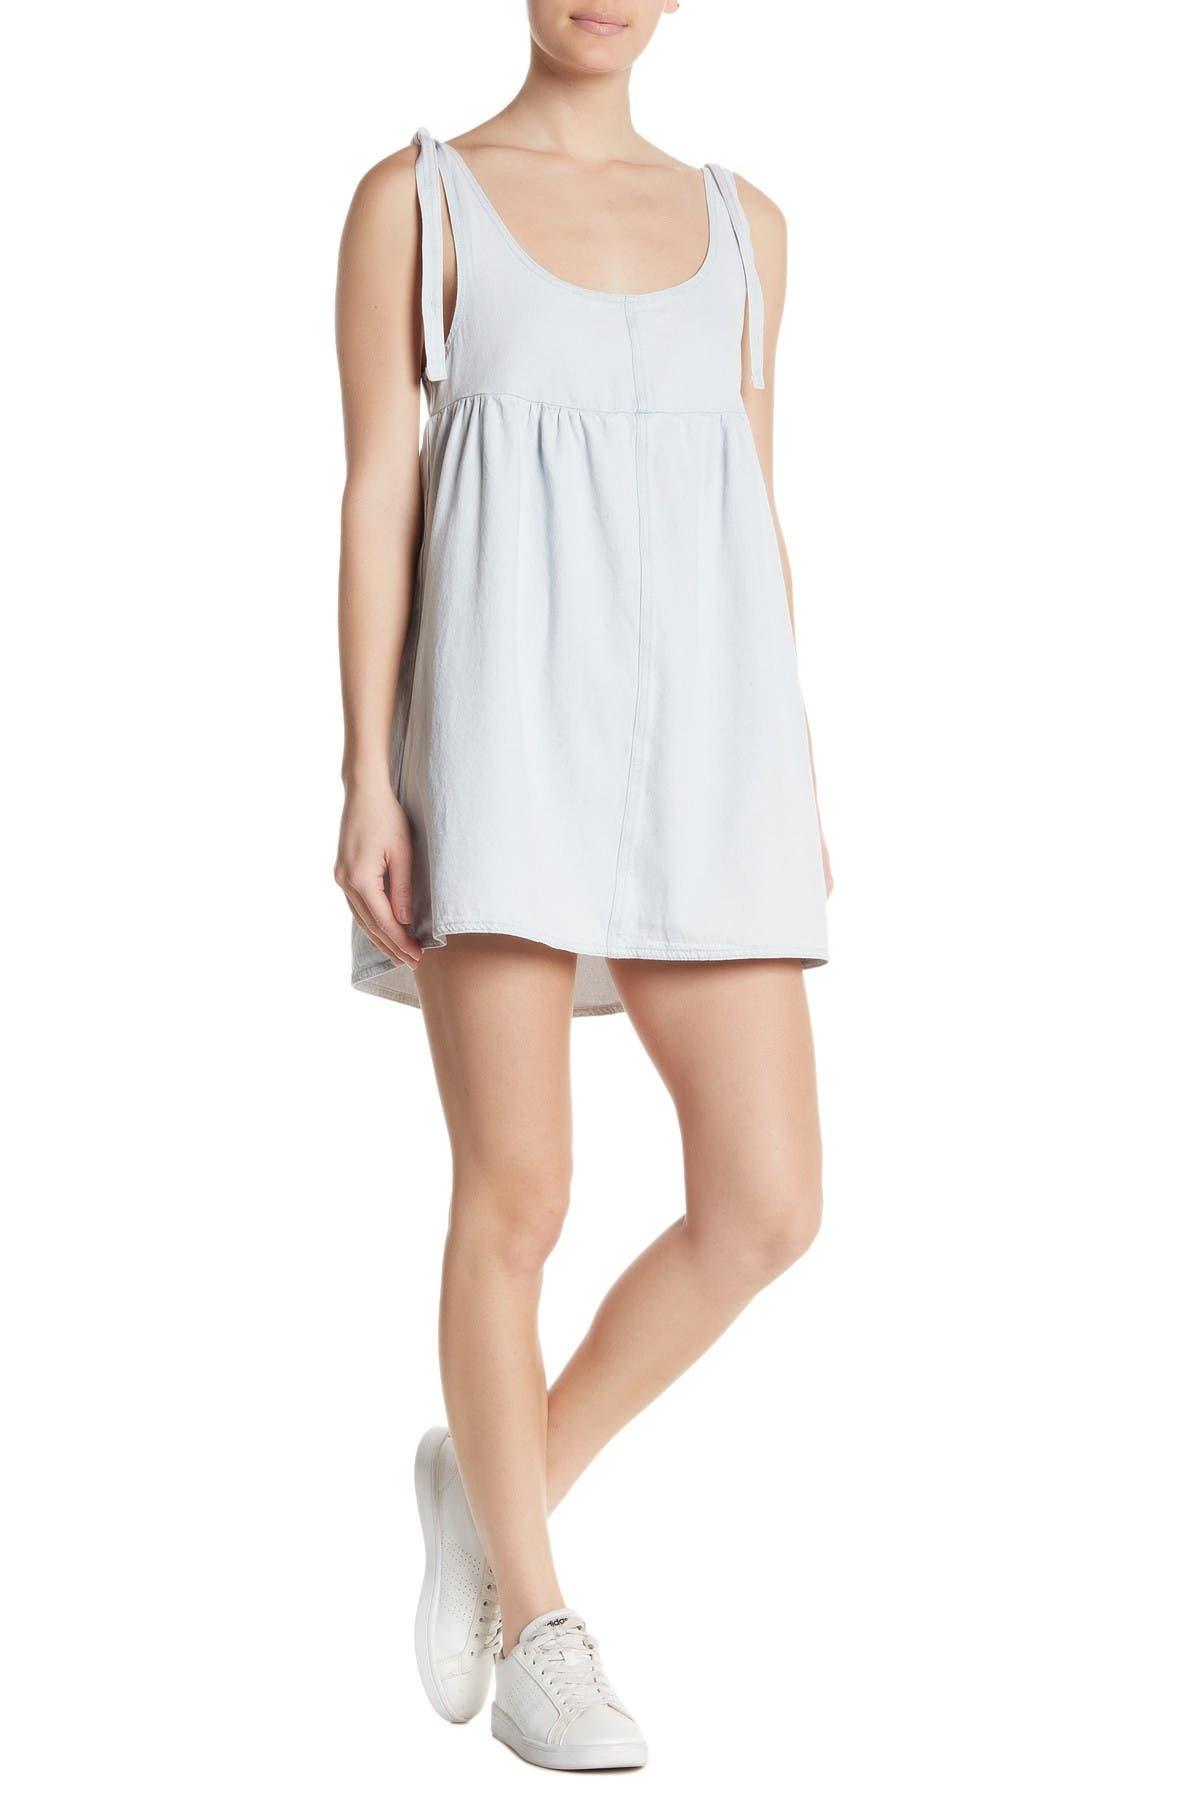 Image of Cotton On Denim Babydoll Pinafore Mini Dress